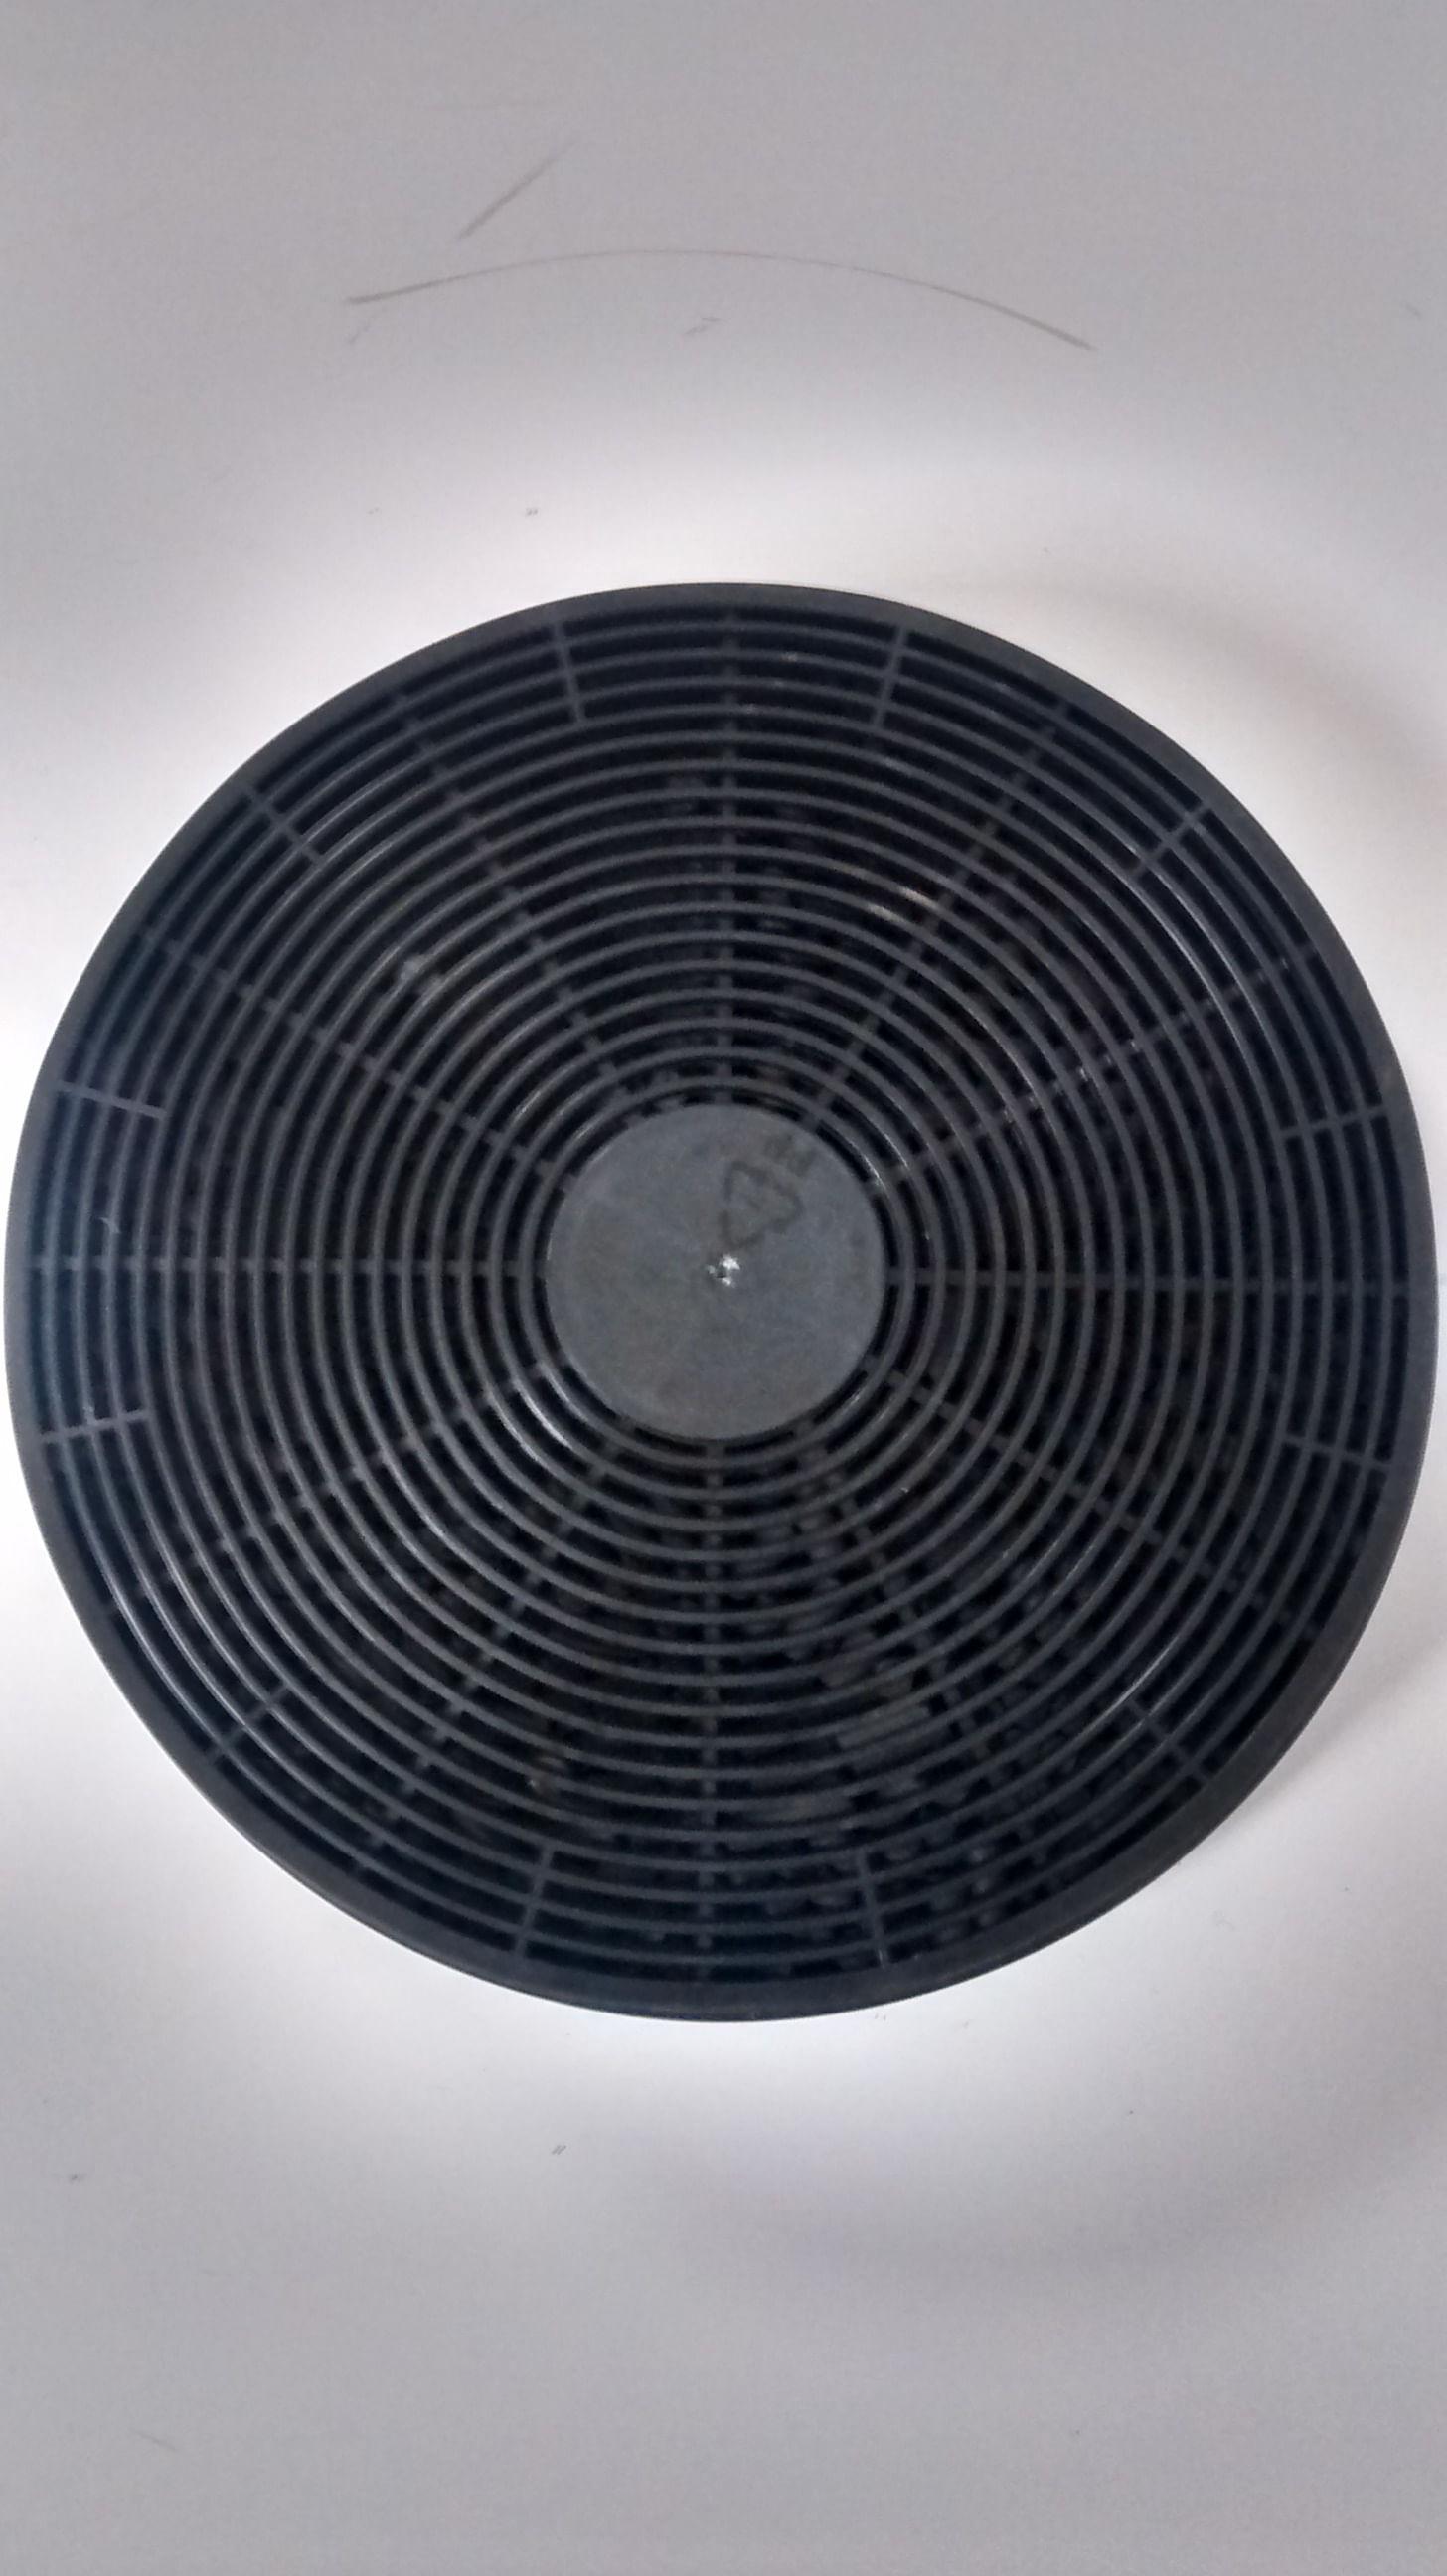 Filtro de Carvão para Coifas - 4806380